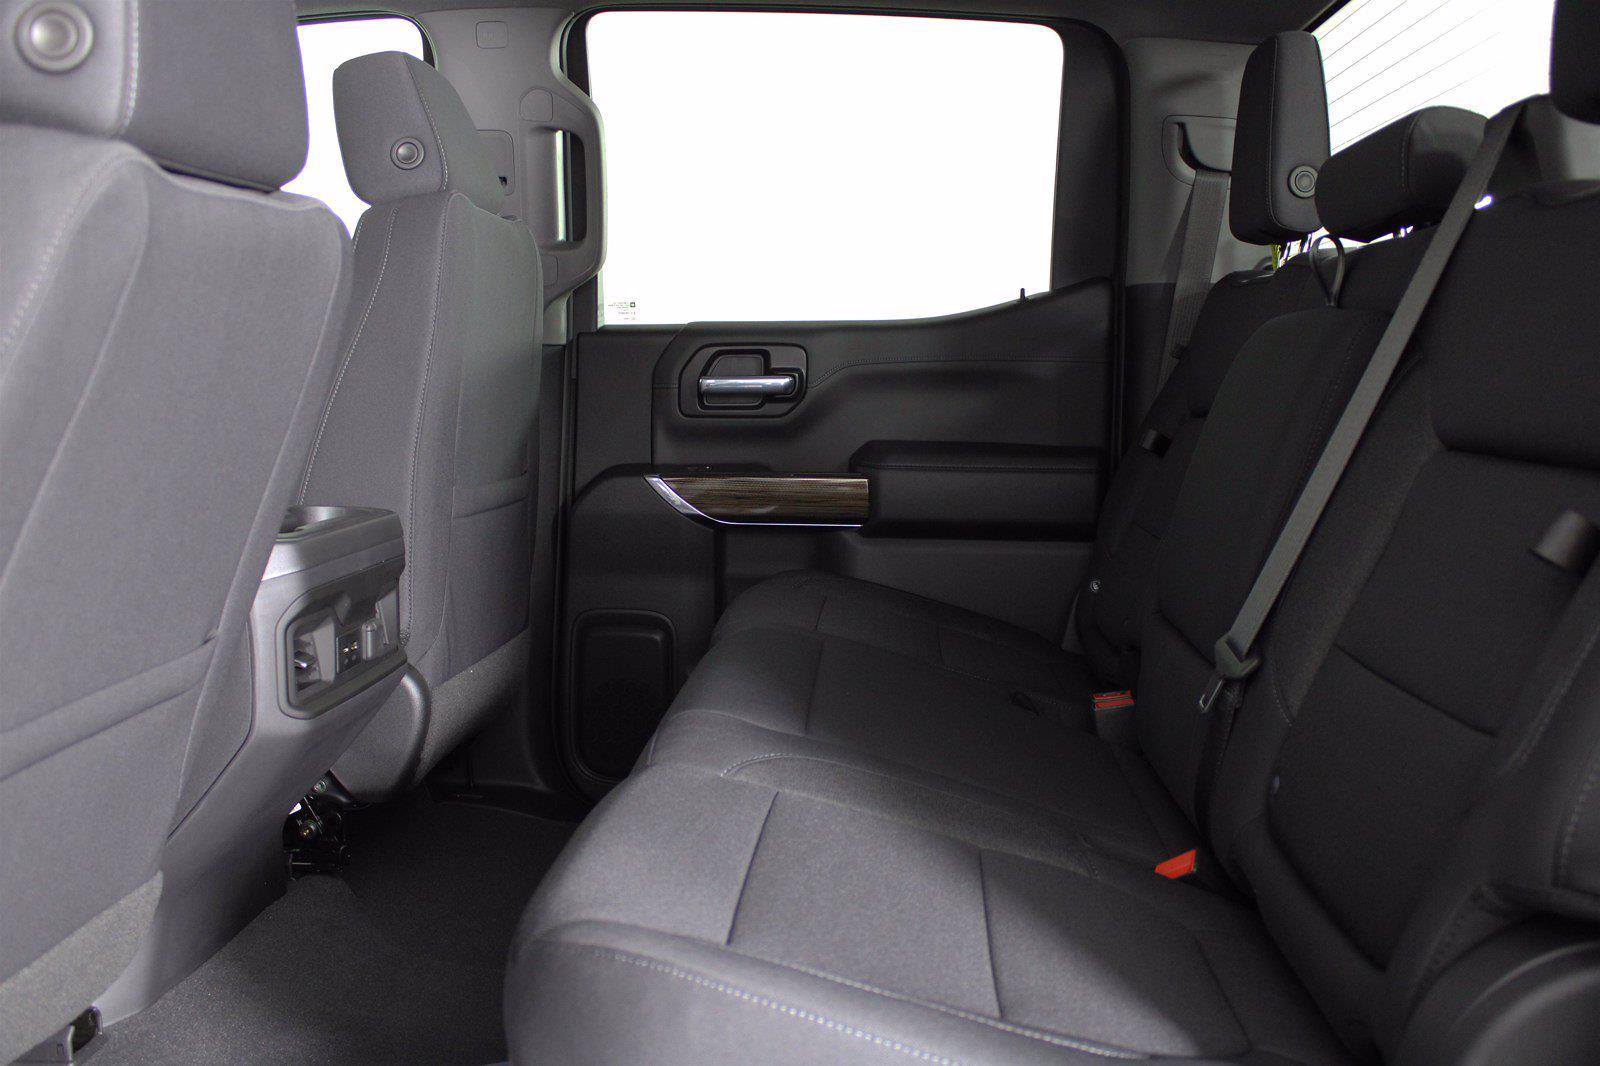 2021 Chevrolet Silverado 1500 Crew Cab 4x4, Pickup #D111114 - photo 15